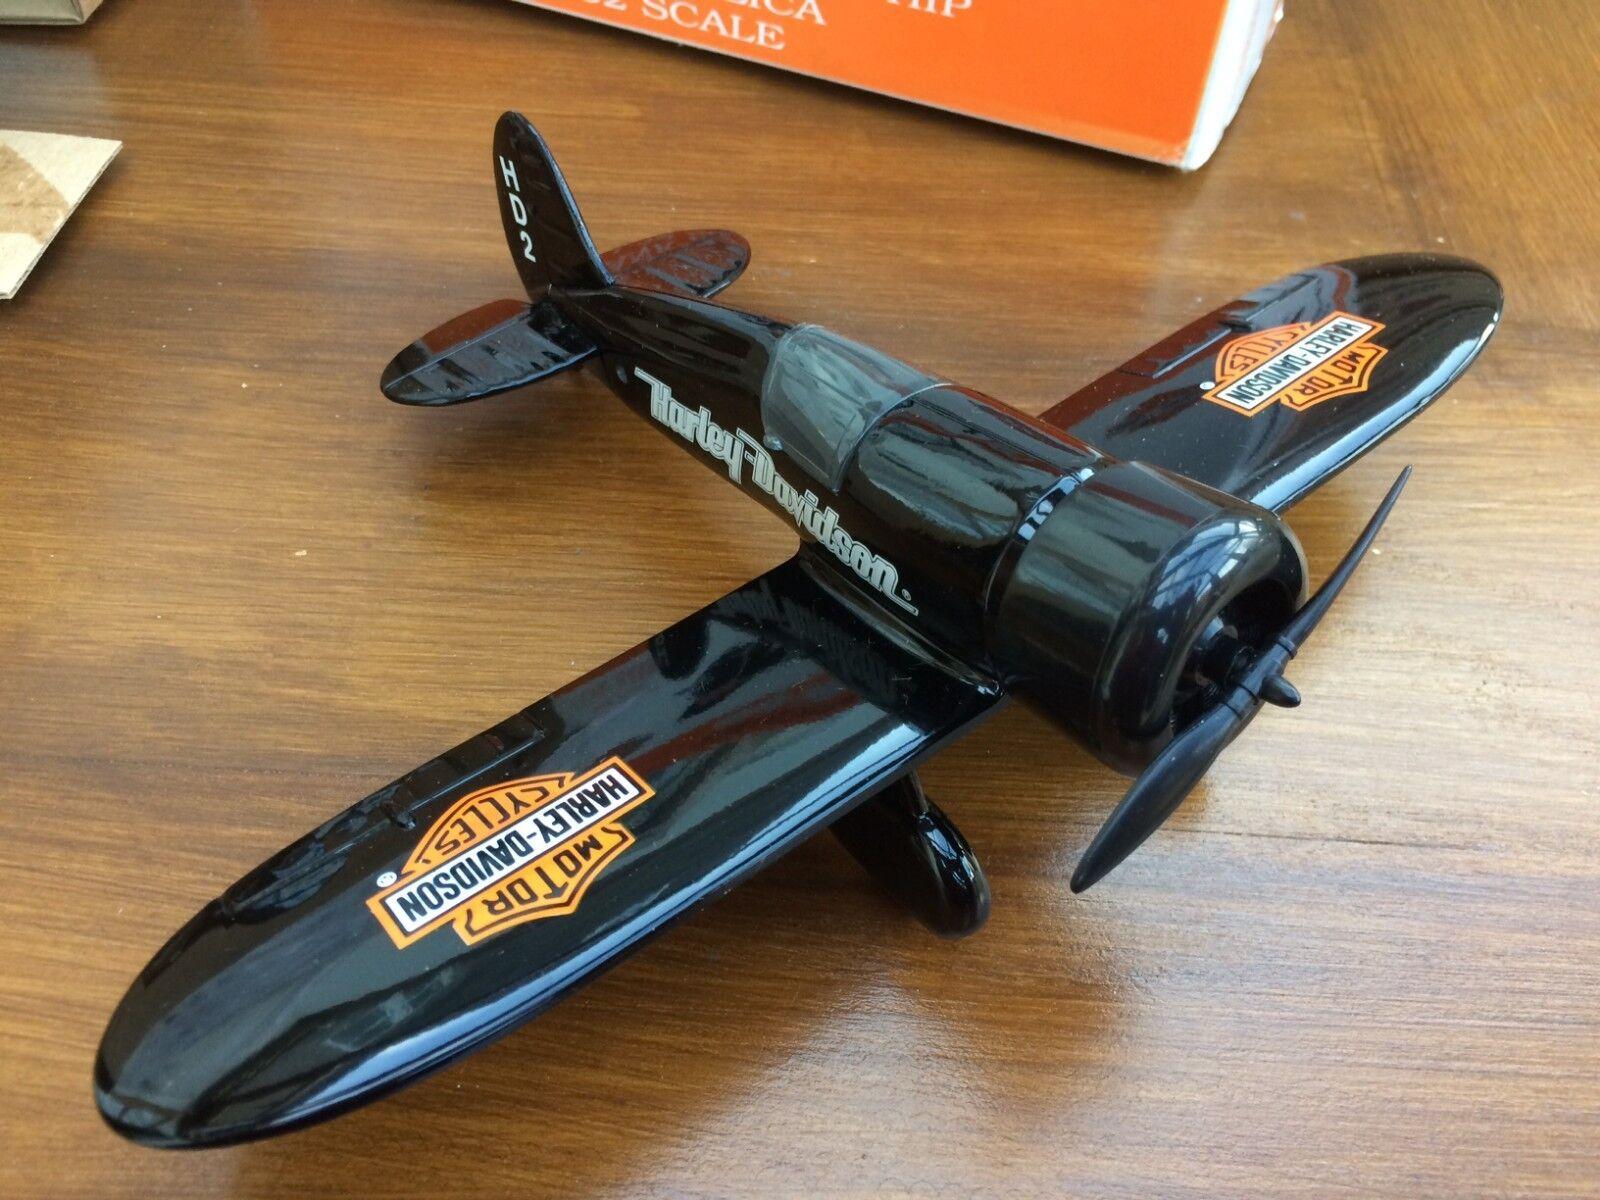 Wings of TEXACO Coin Bank Diecast modello aereo STEARMAN CURTISS ROBIN HARLEY